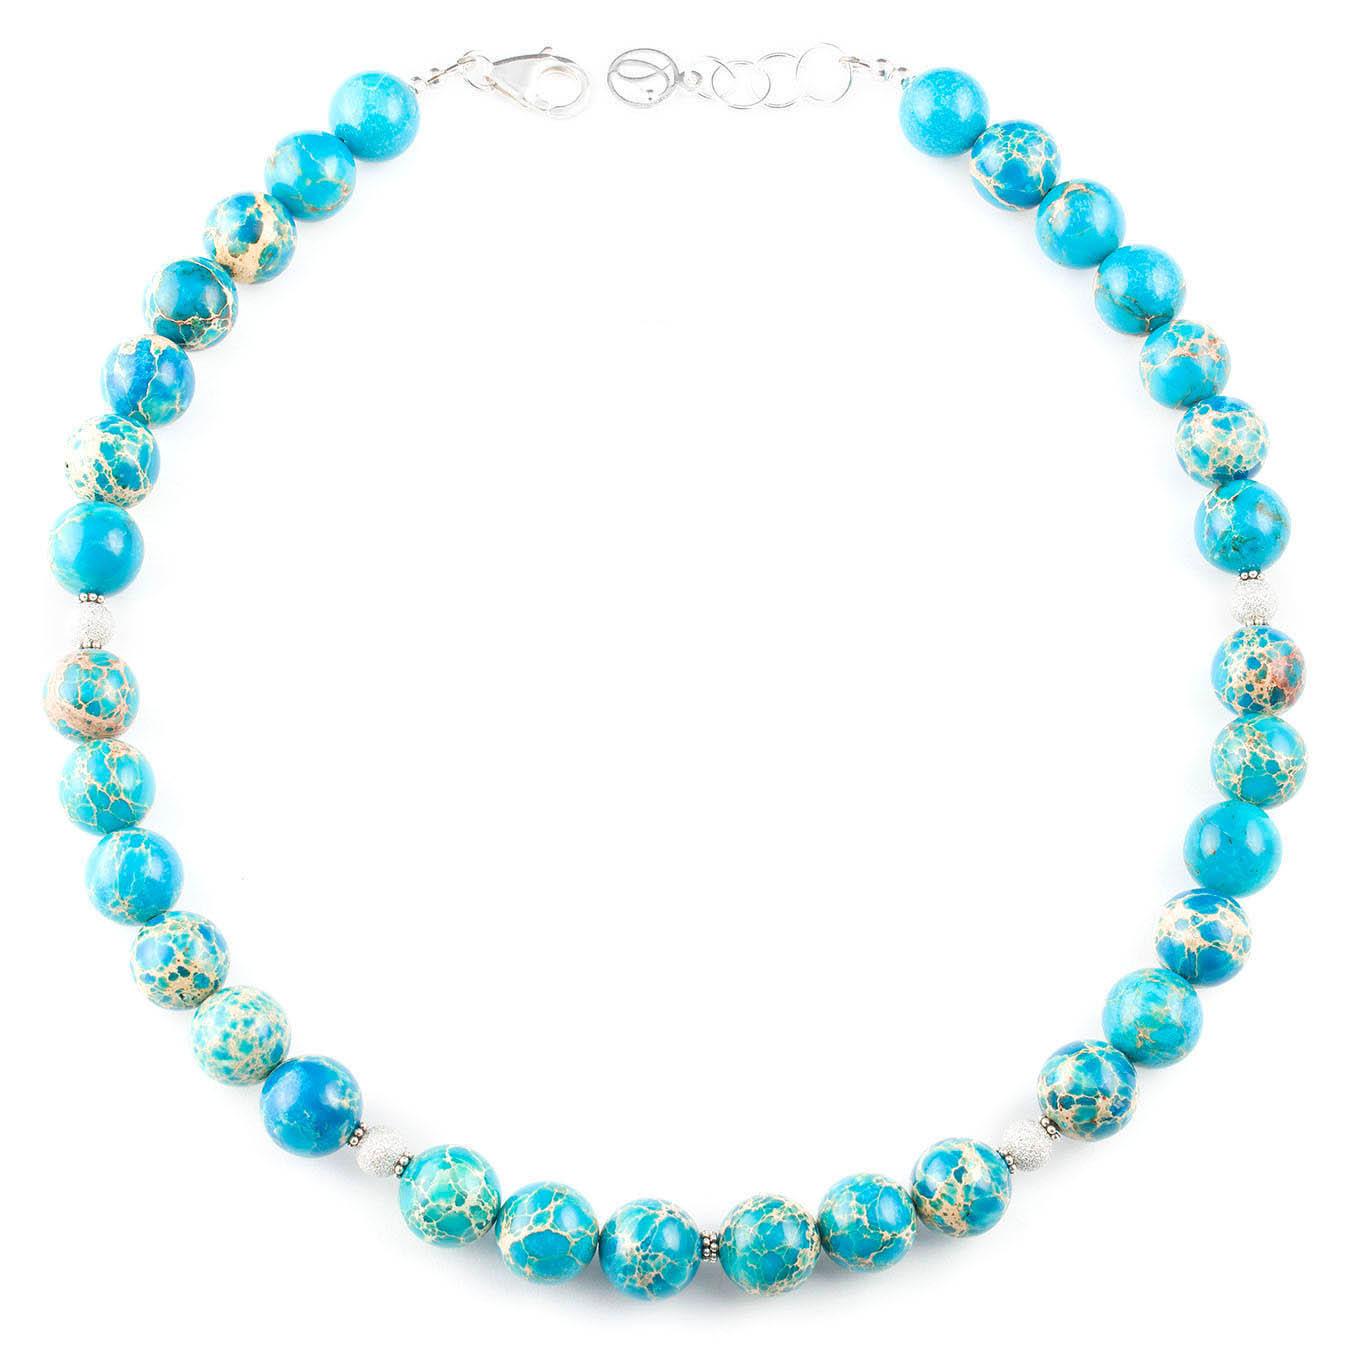 Semi-precious gemstones necklace set made of jasper and silver beads